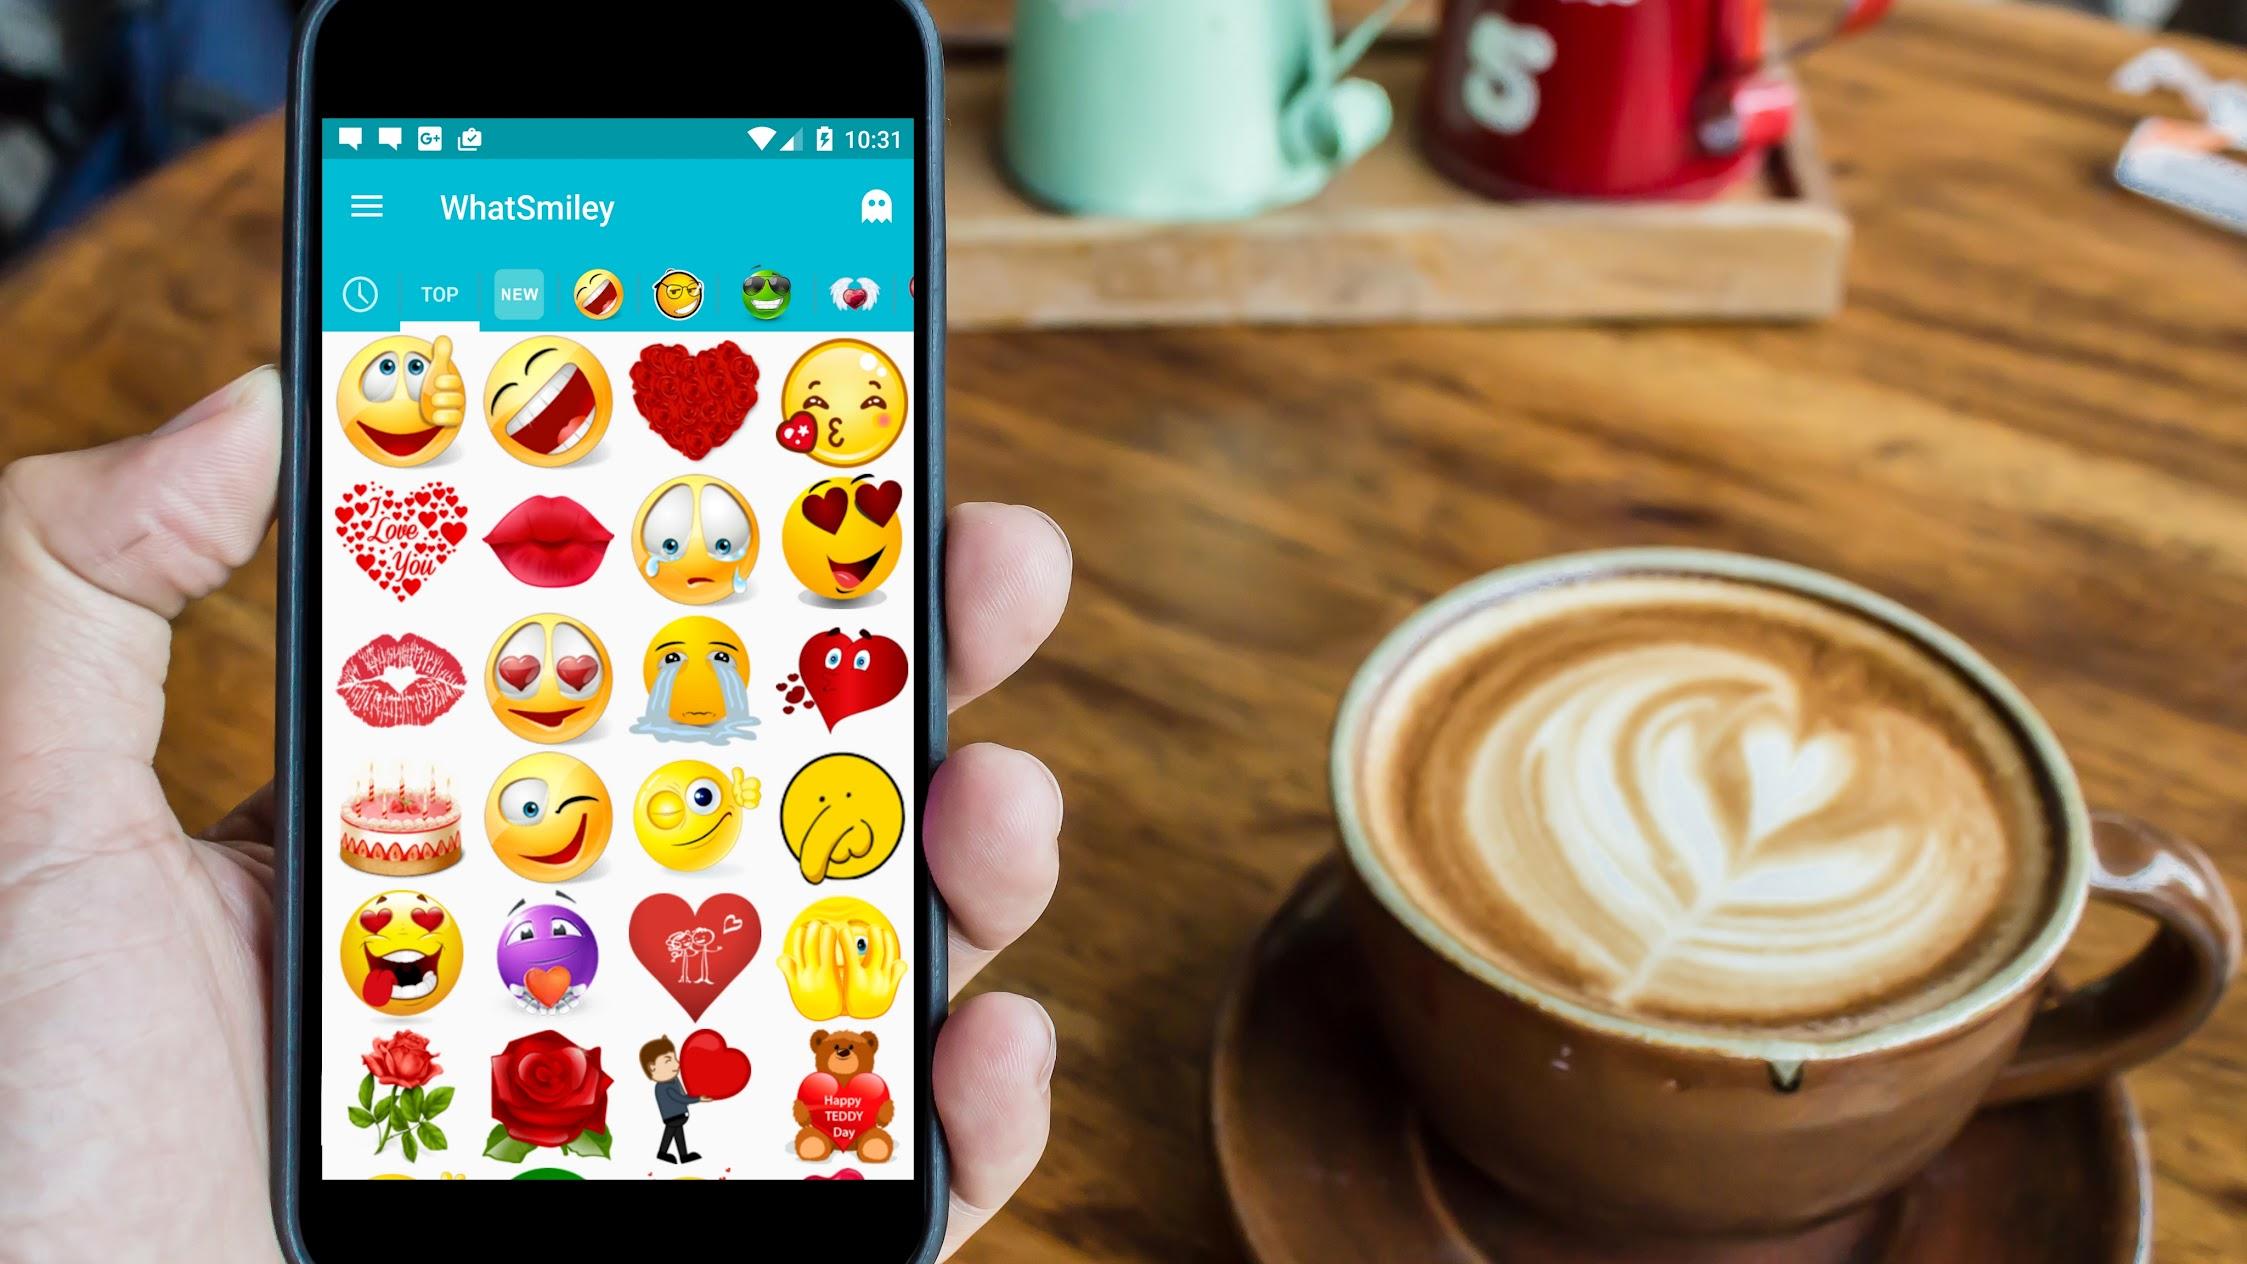 Share It Again - Smileys & Emoji Apps